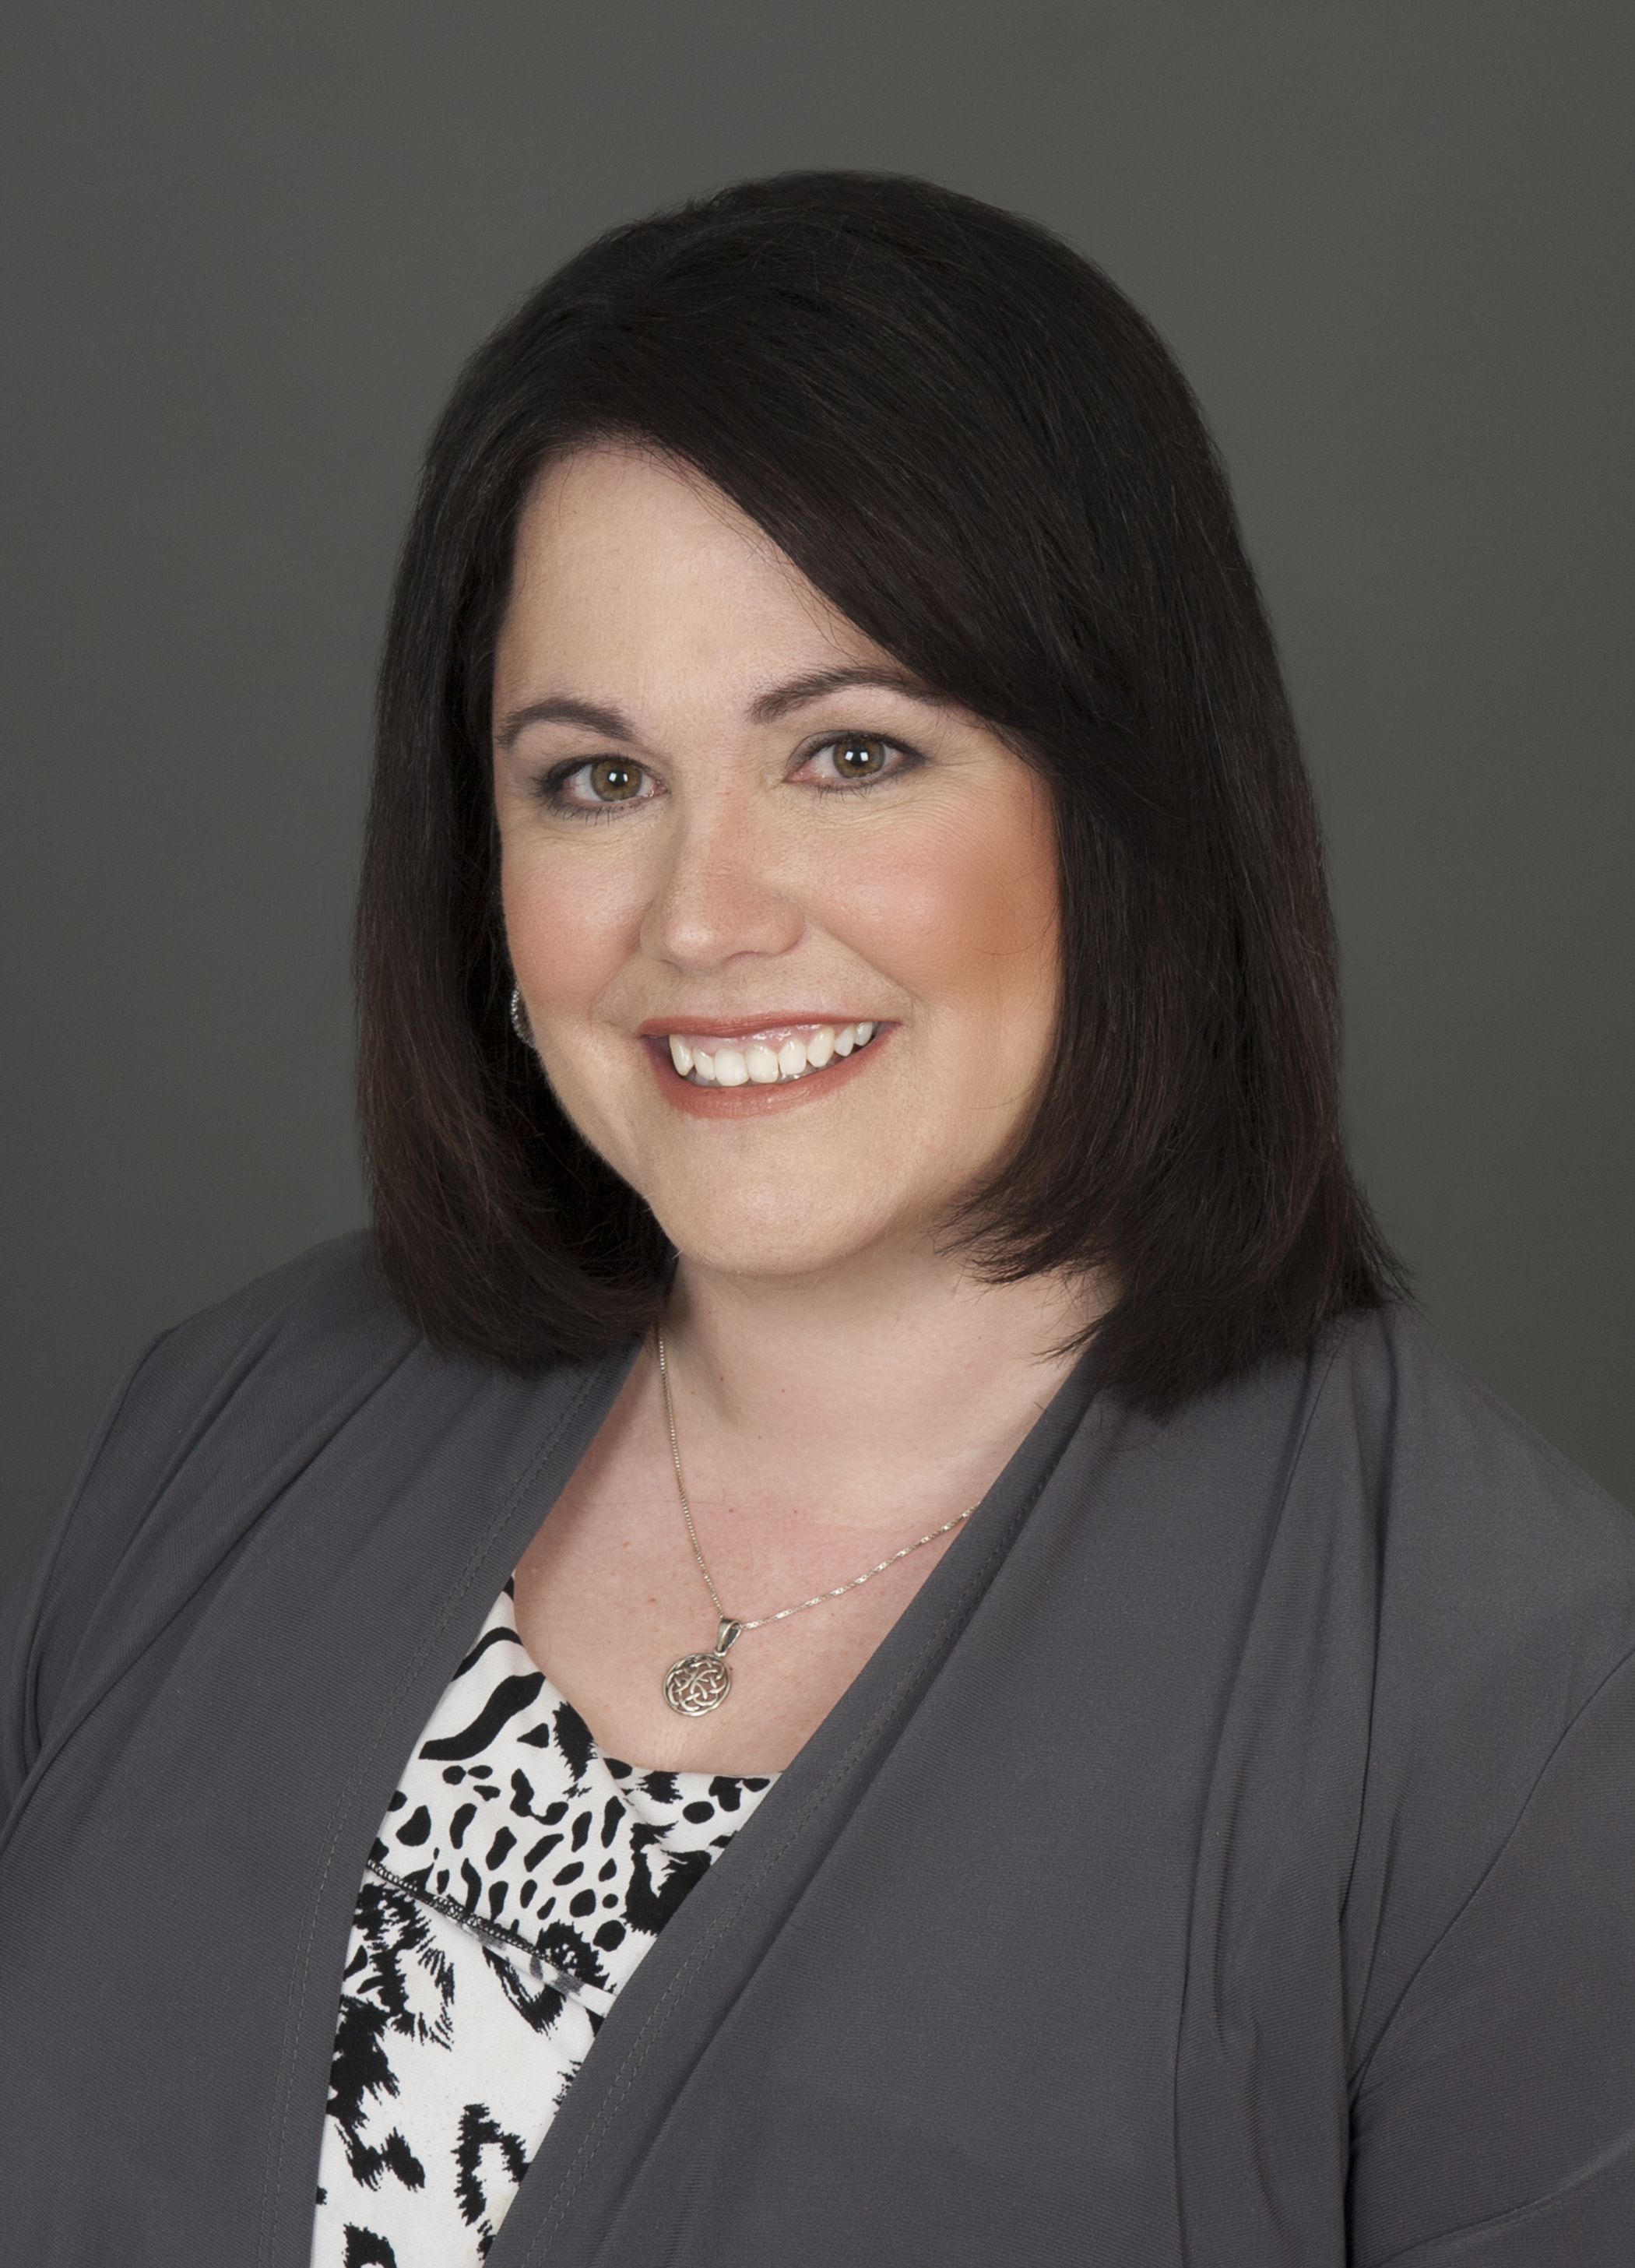 Susan Currie Headshot.JPG